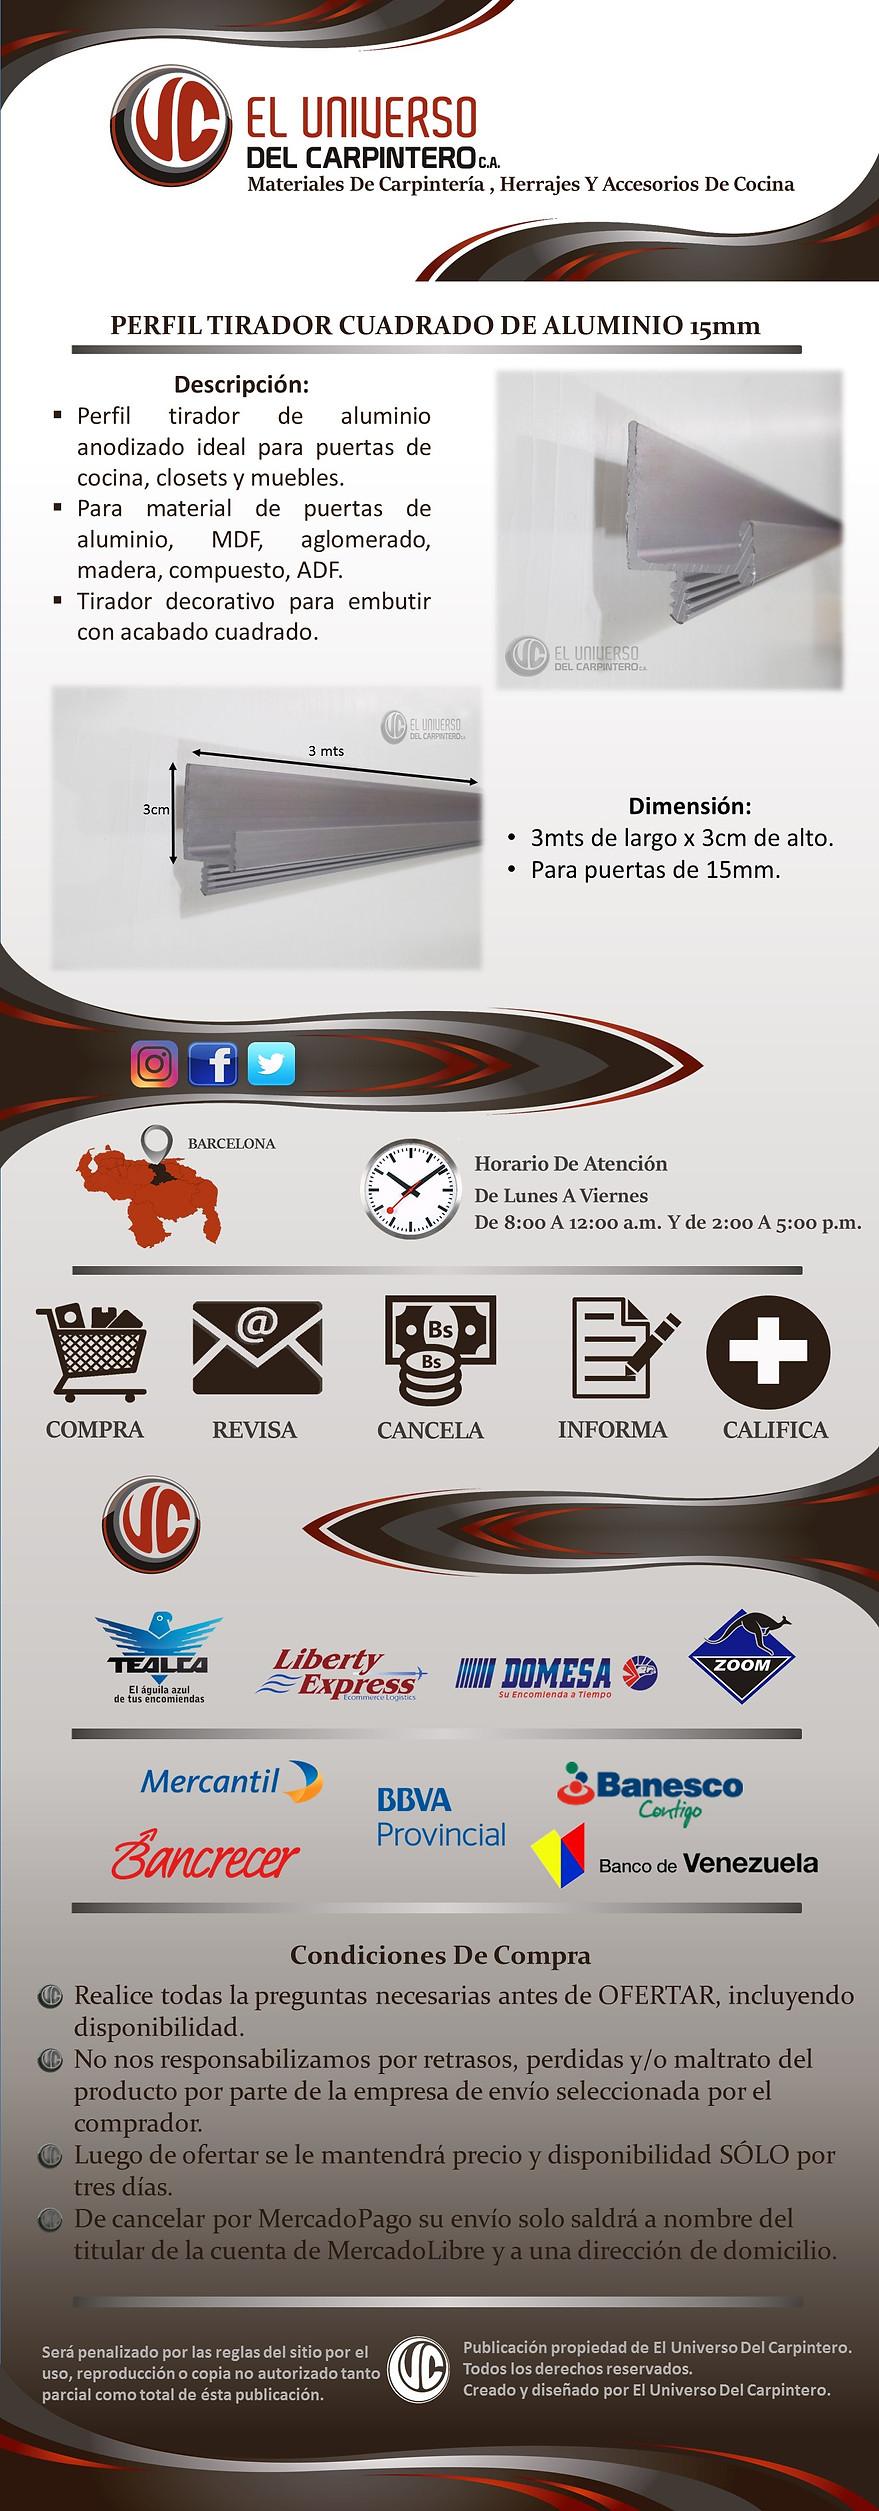 Perfil de aluminio tirador cuadrado 15mm perfiler a cocina - Perfil de aluminio precio ...